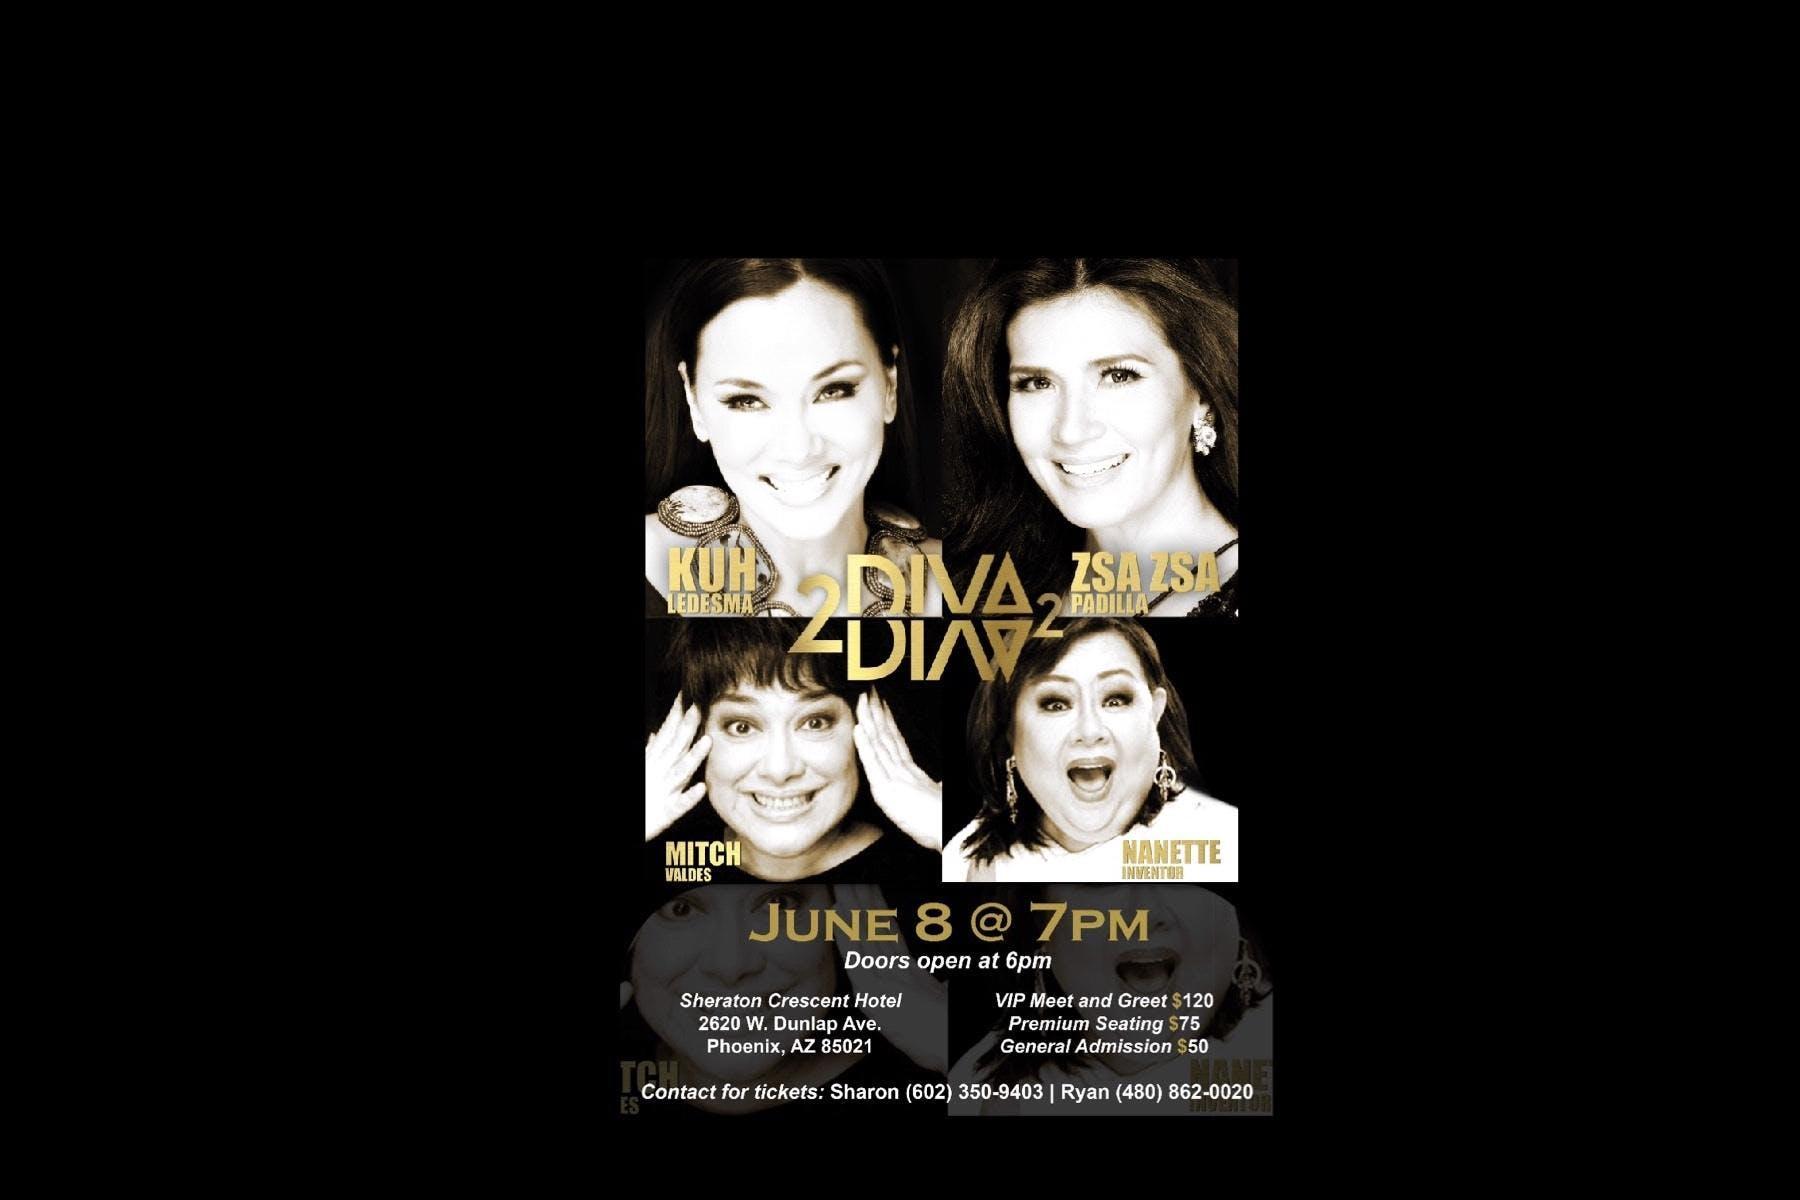 DIVA2DIVA LIVE IN AZ!